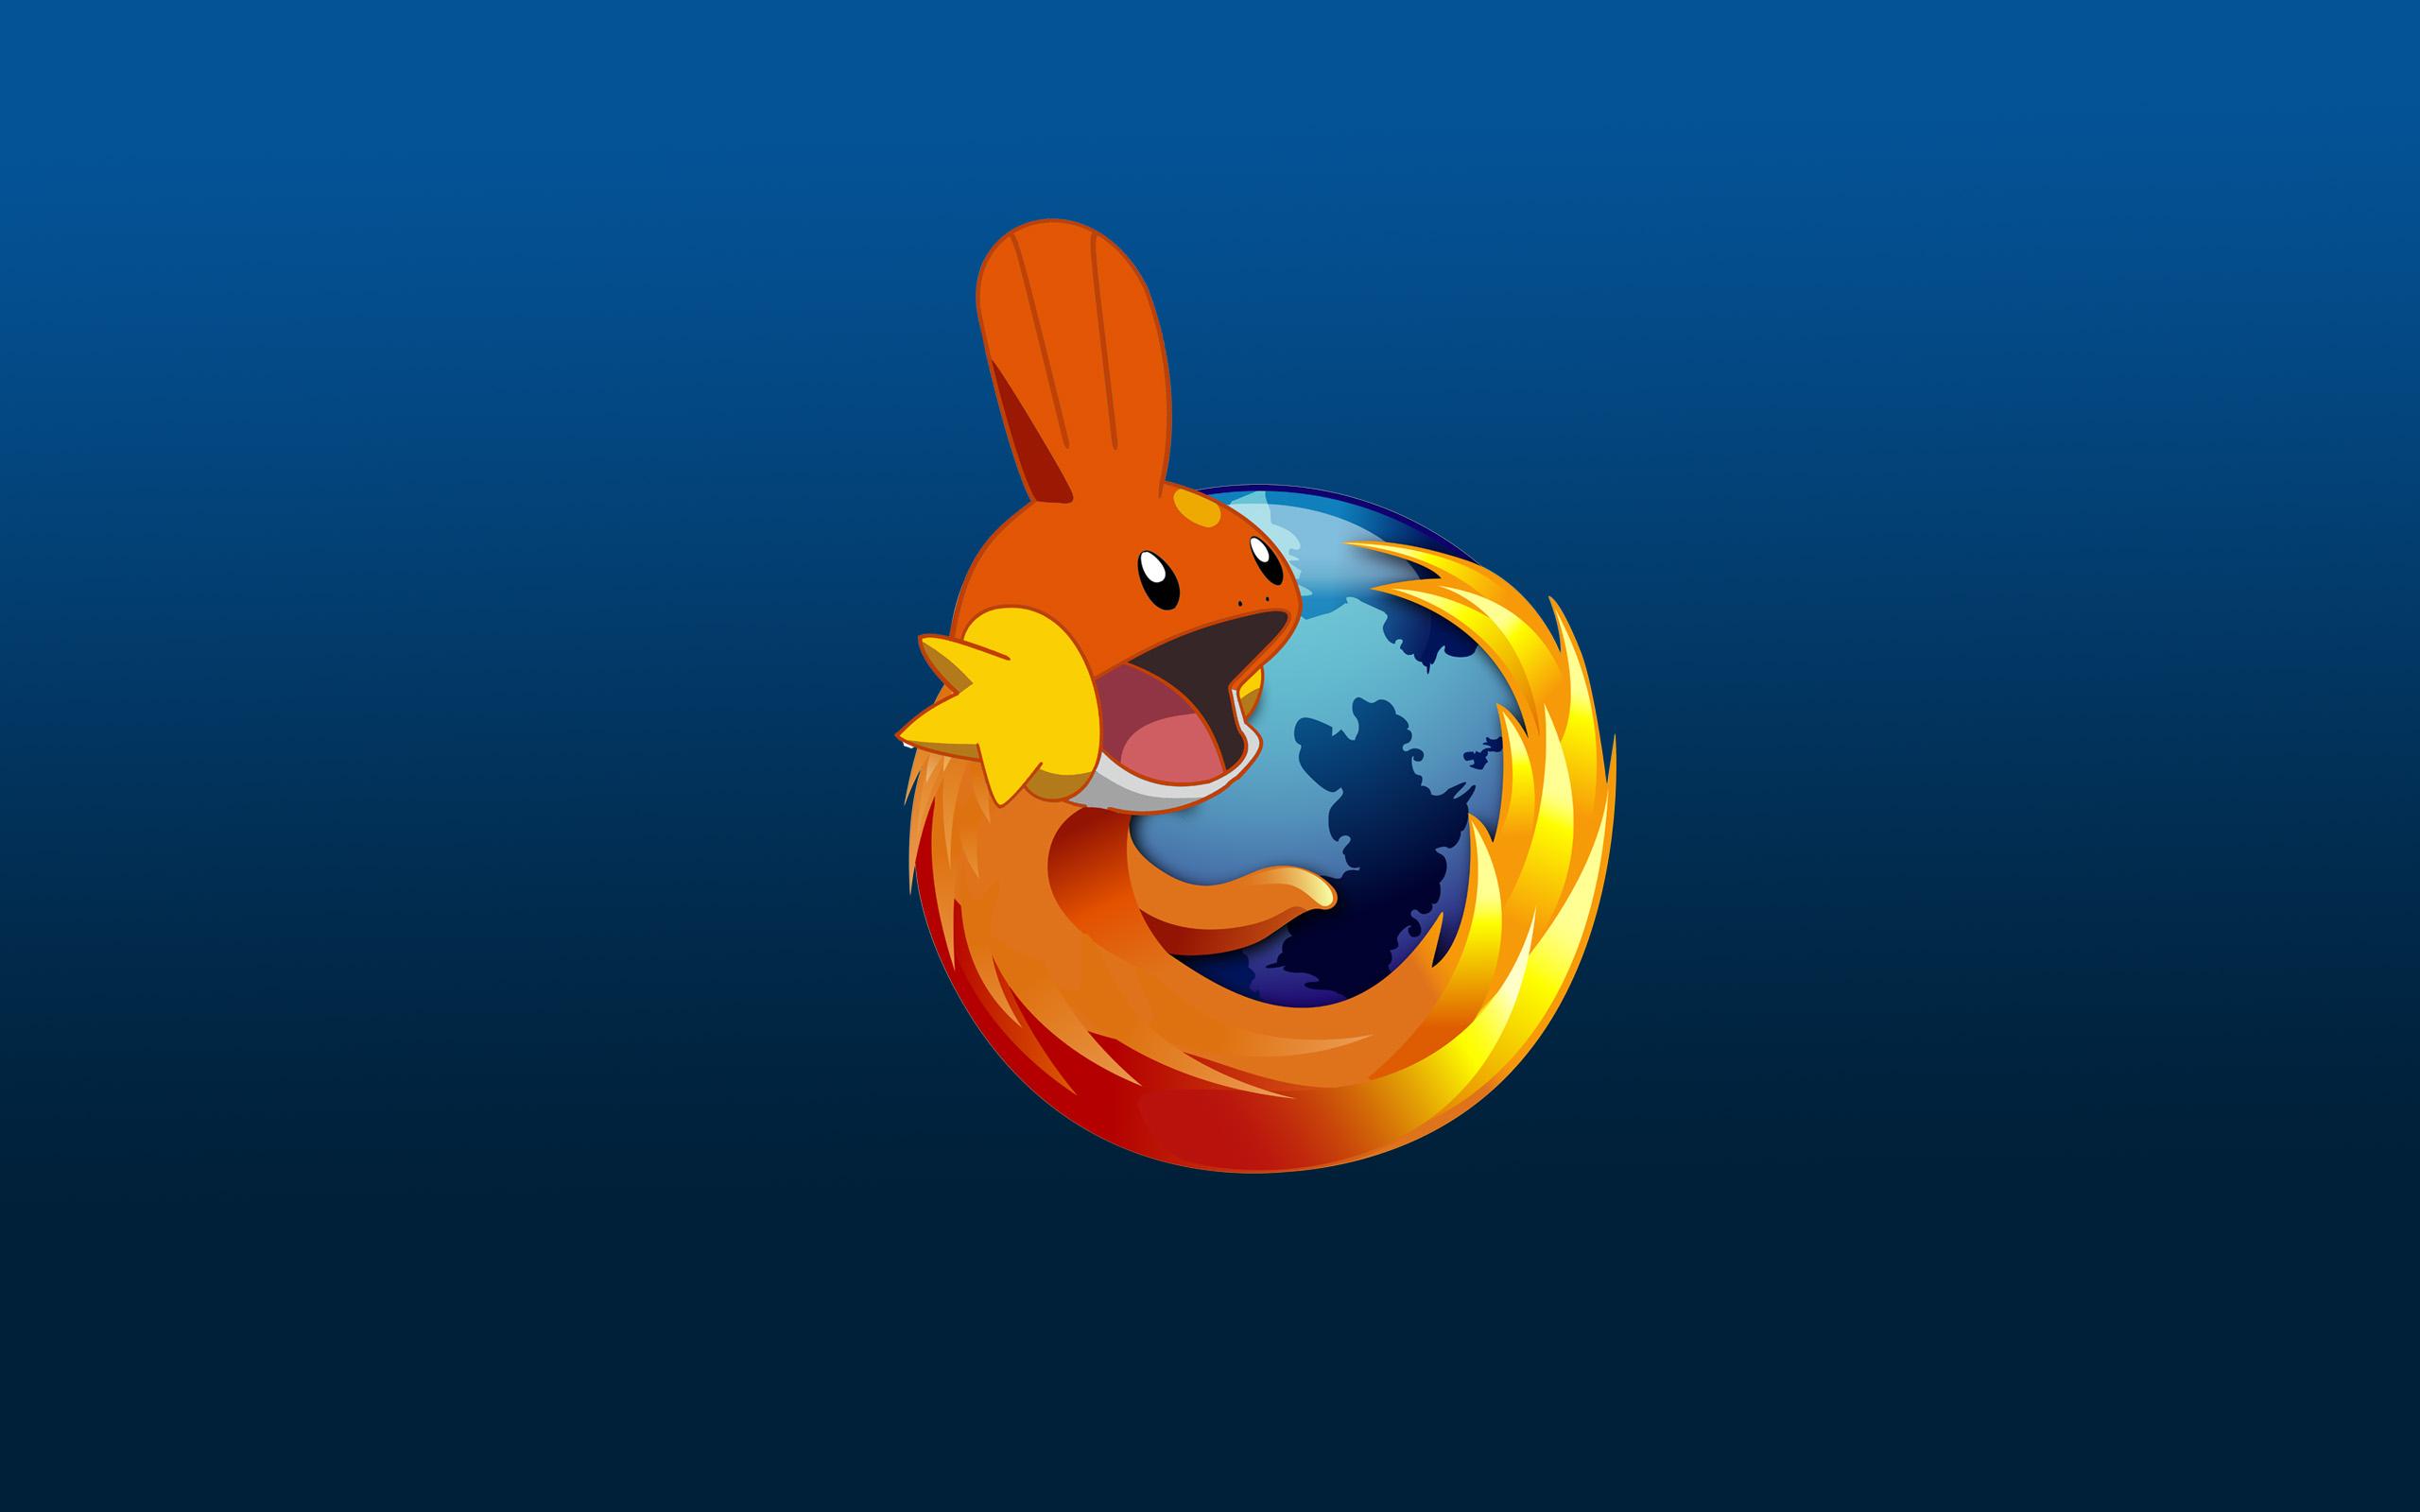 Firefox Computer Wallpapers Desktop Backgrounds 2560x1600 Id 18